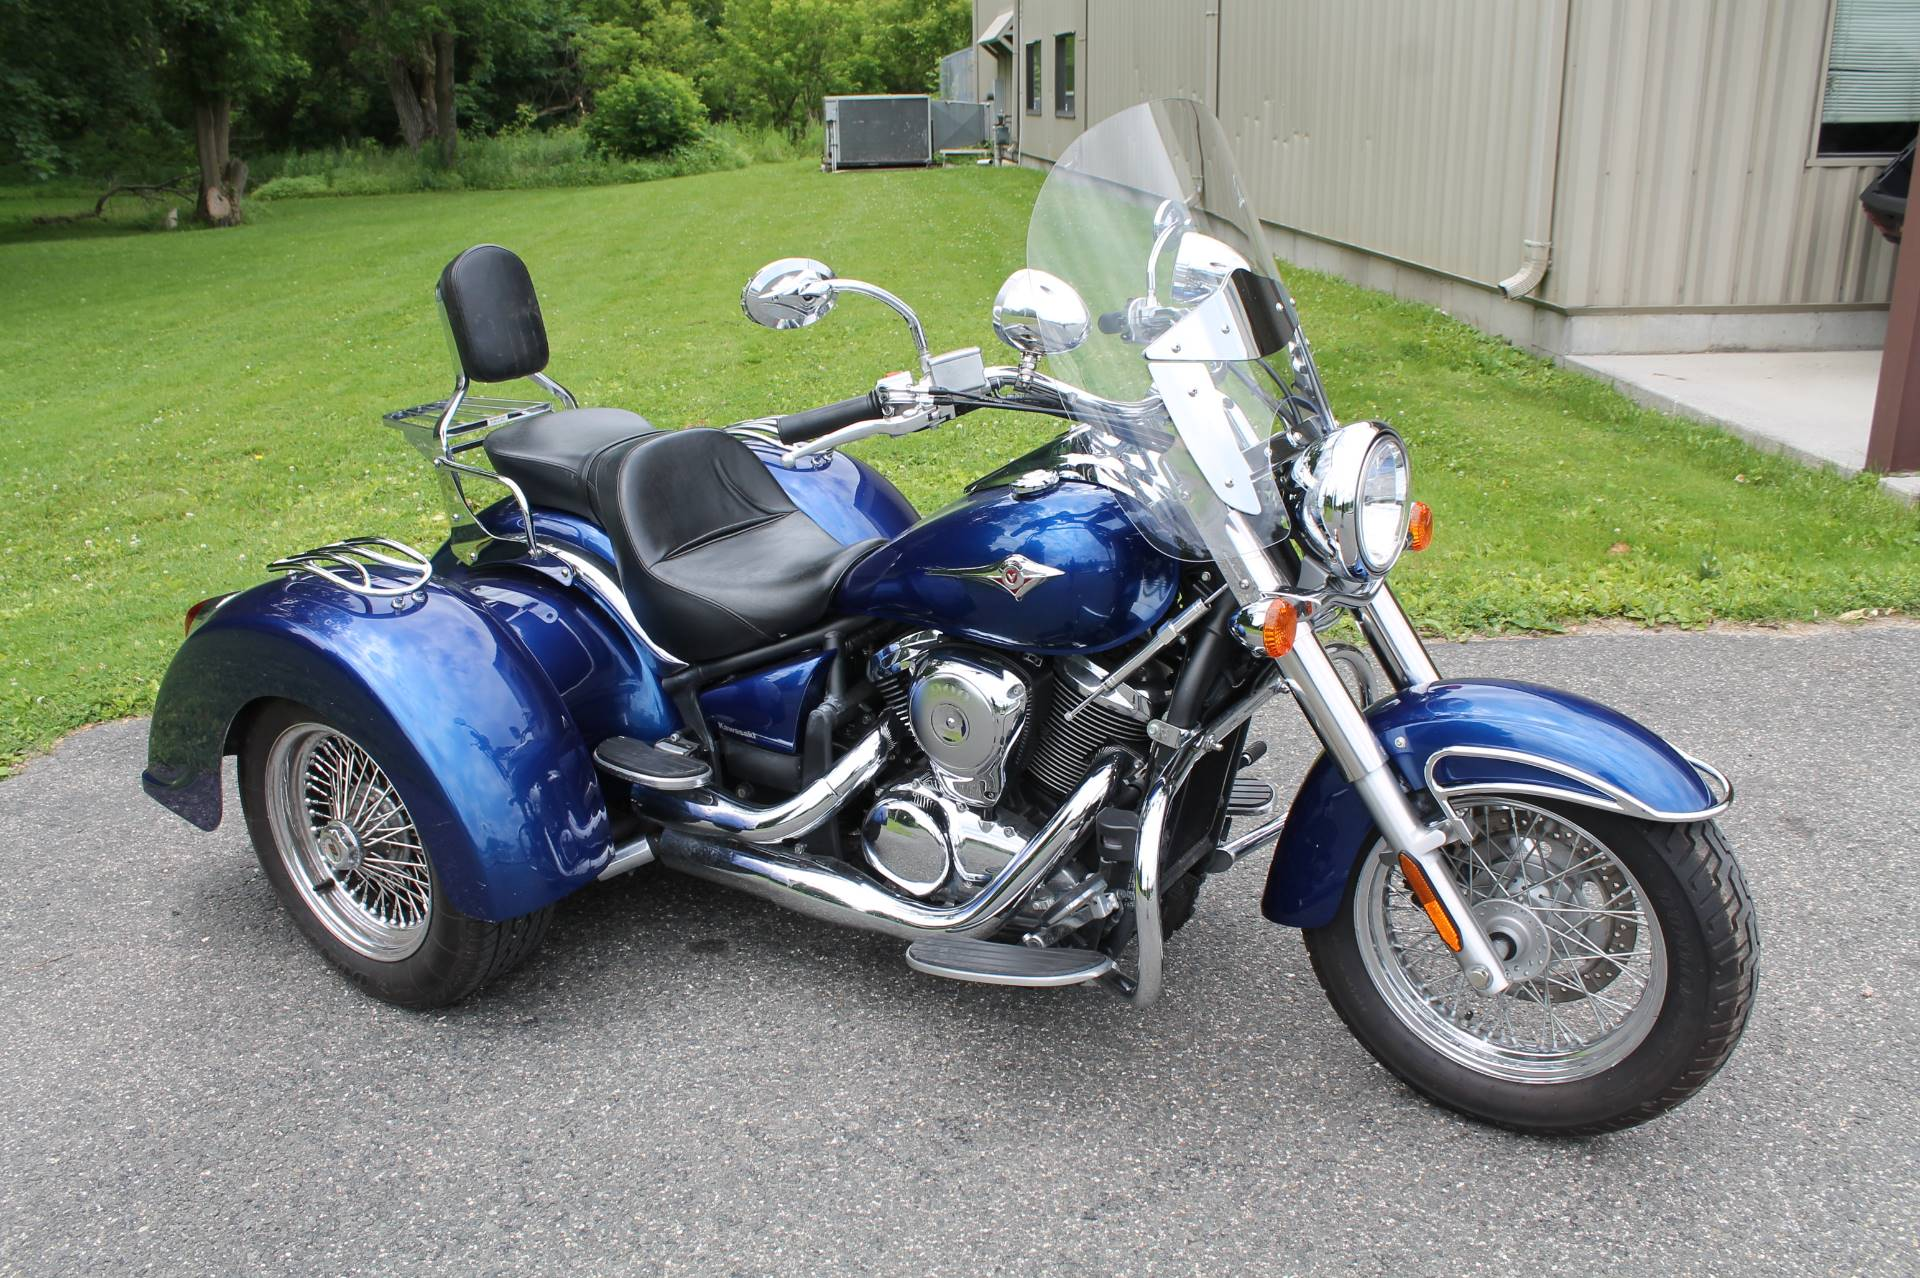 Used 2010 Lehman Trikes/Kawasaki STORM 900 Motorcycles in Adams, MA